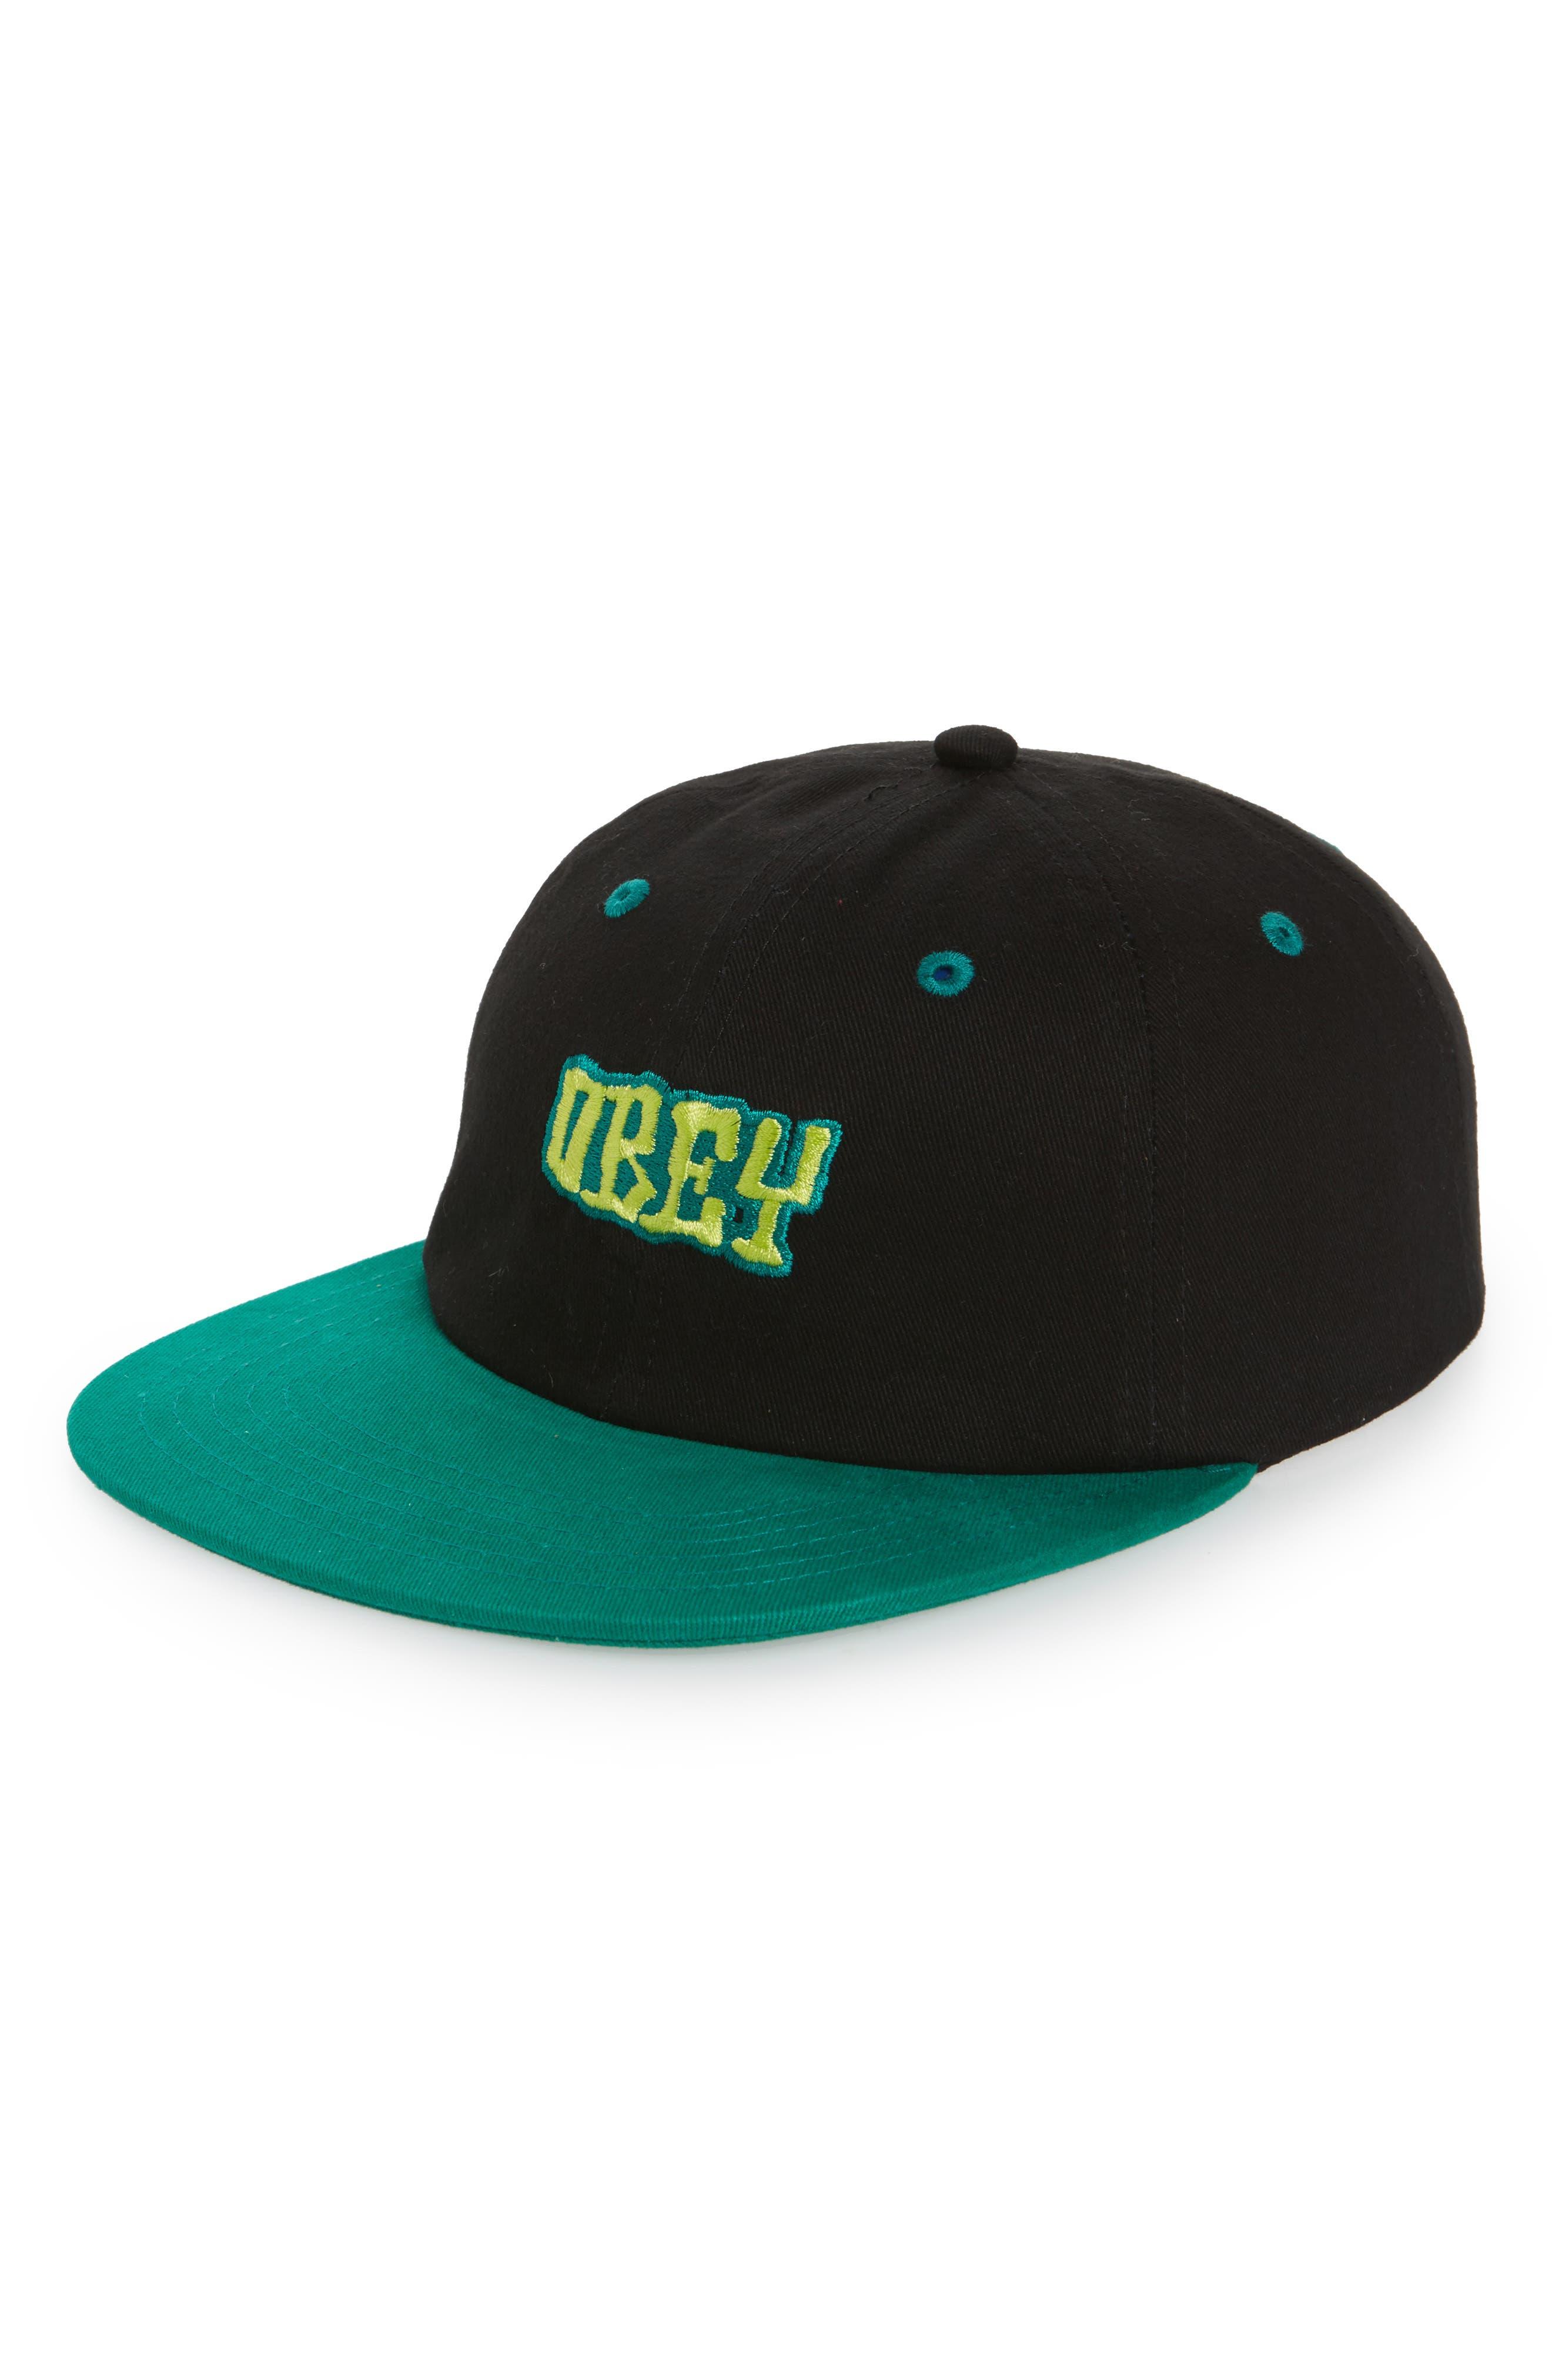 Better Days Snapback Cap,                         Main,                         color, 001